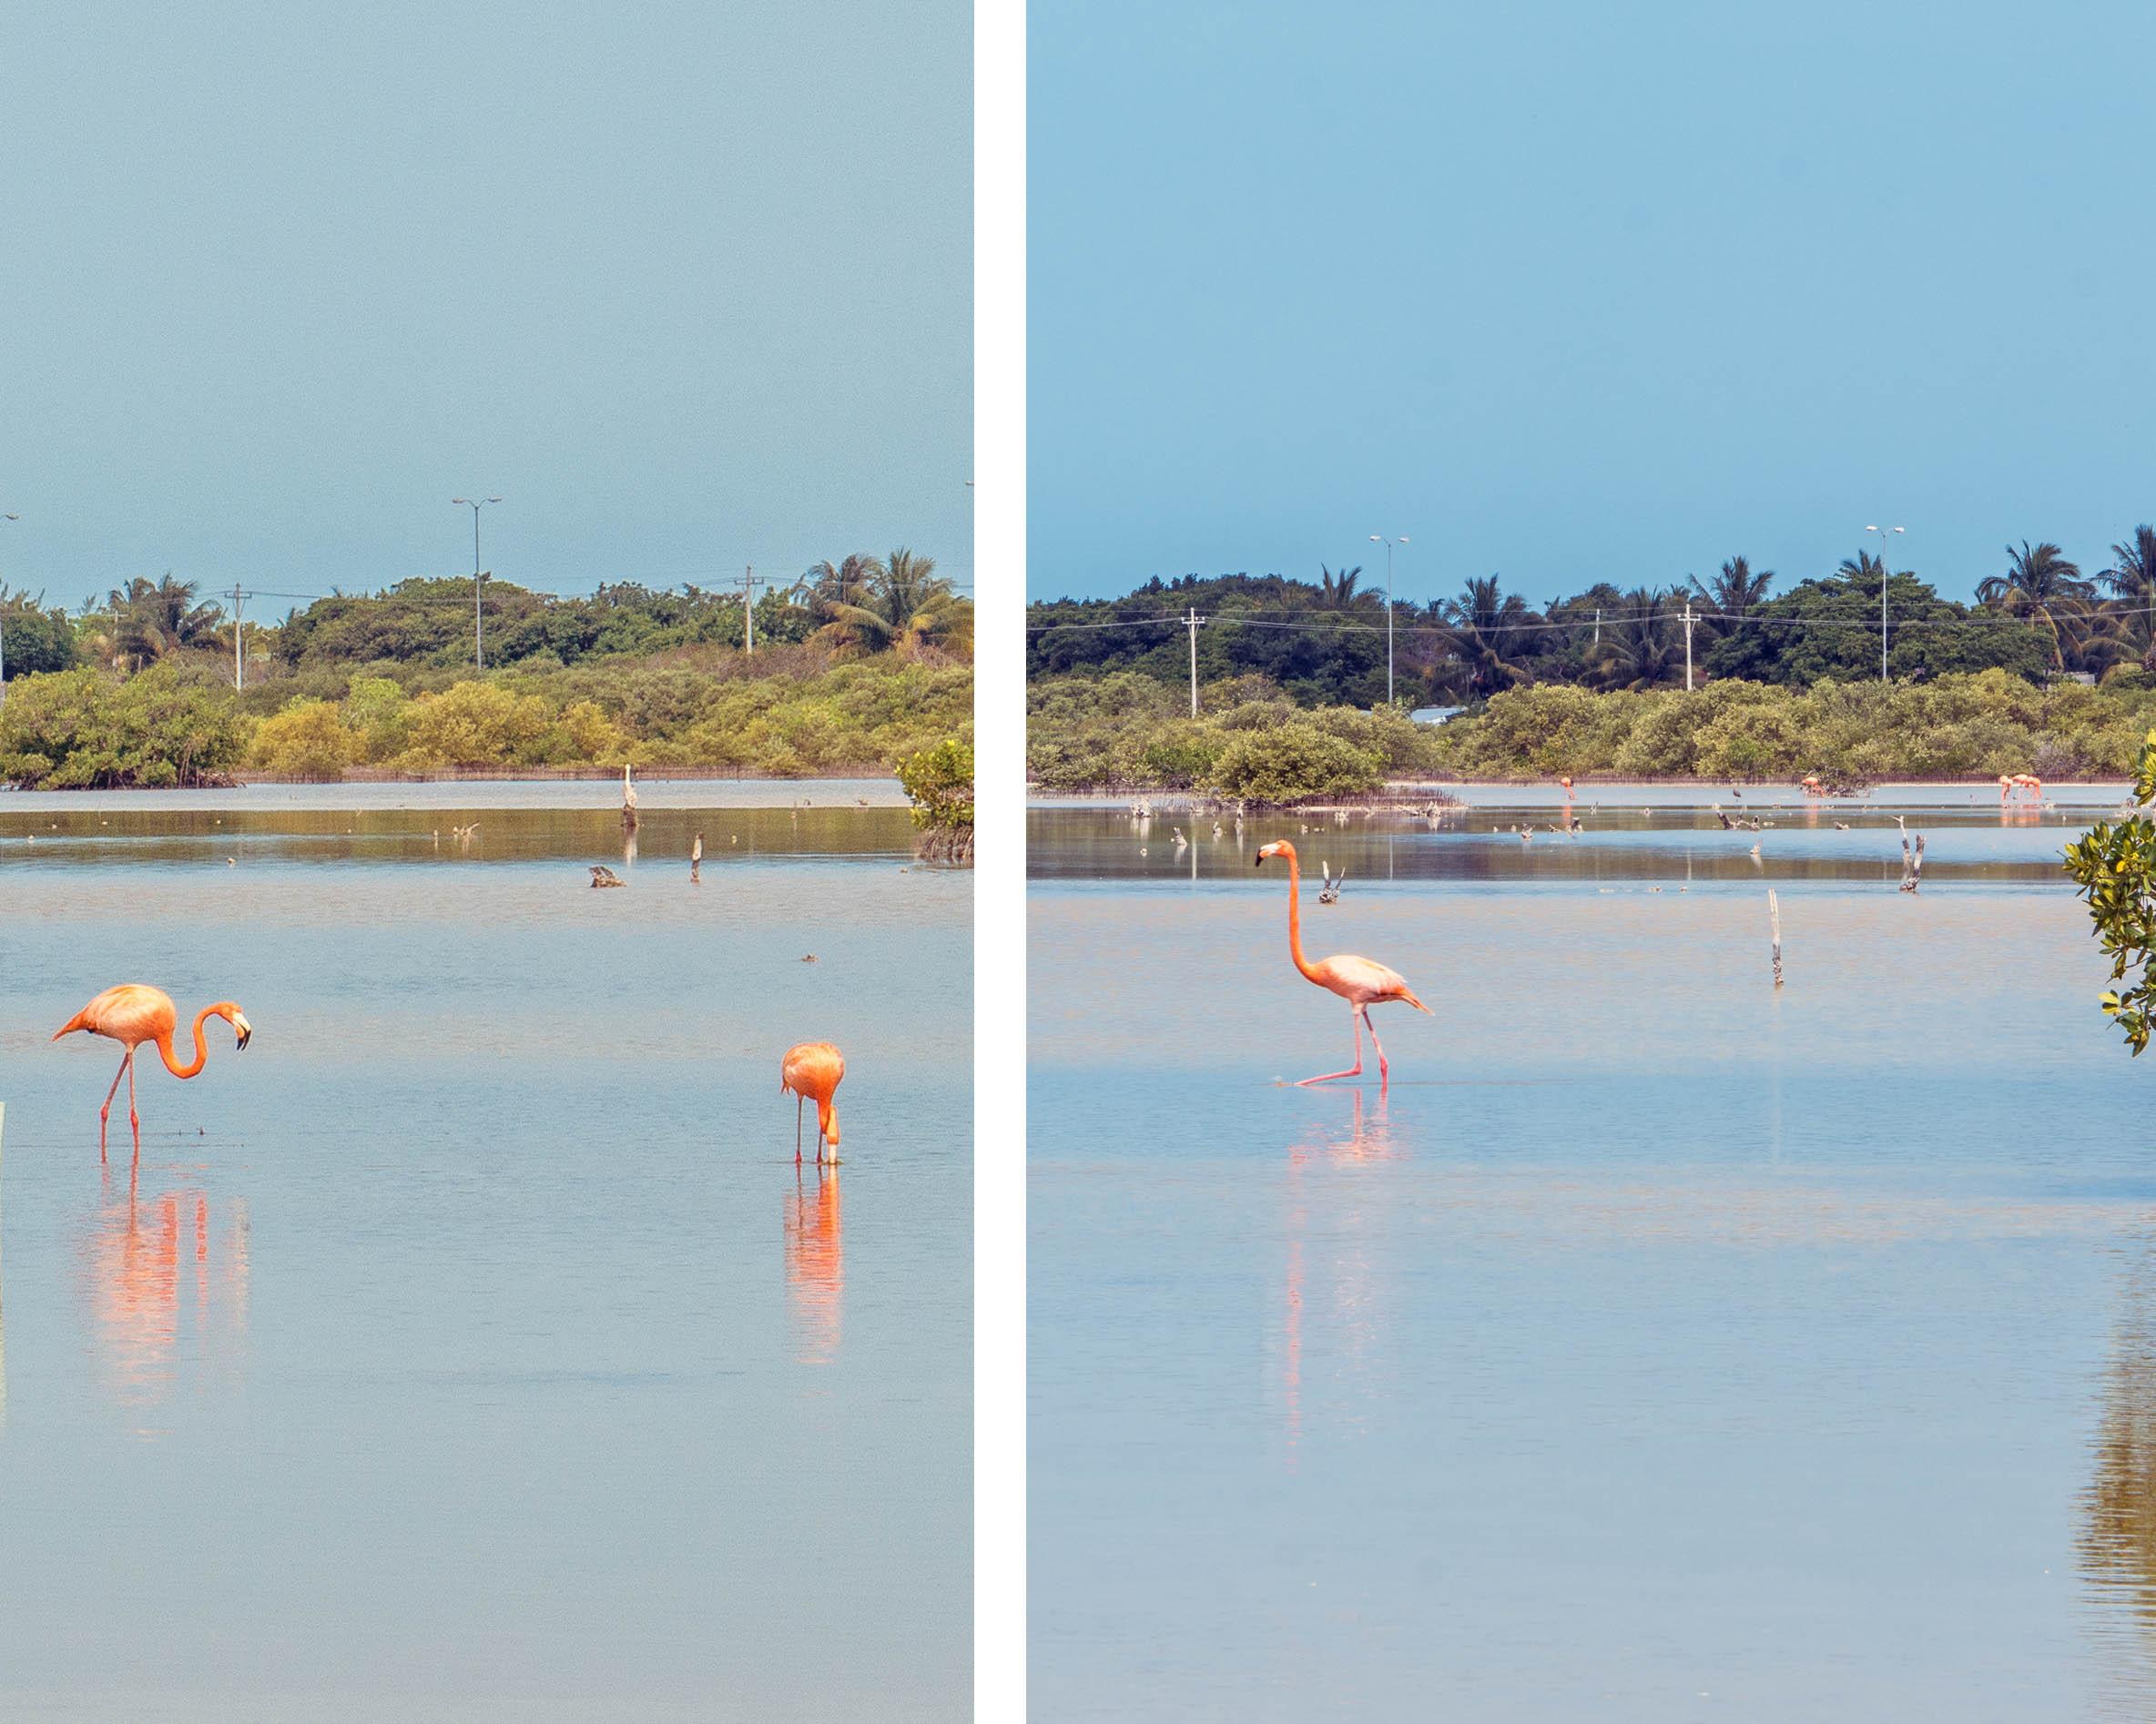 Flamingos near Progreso, Yucatan, Mexico